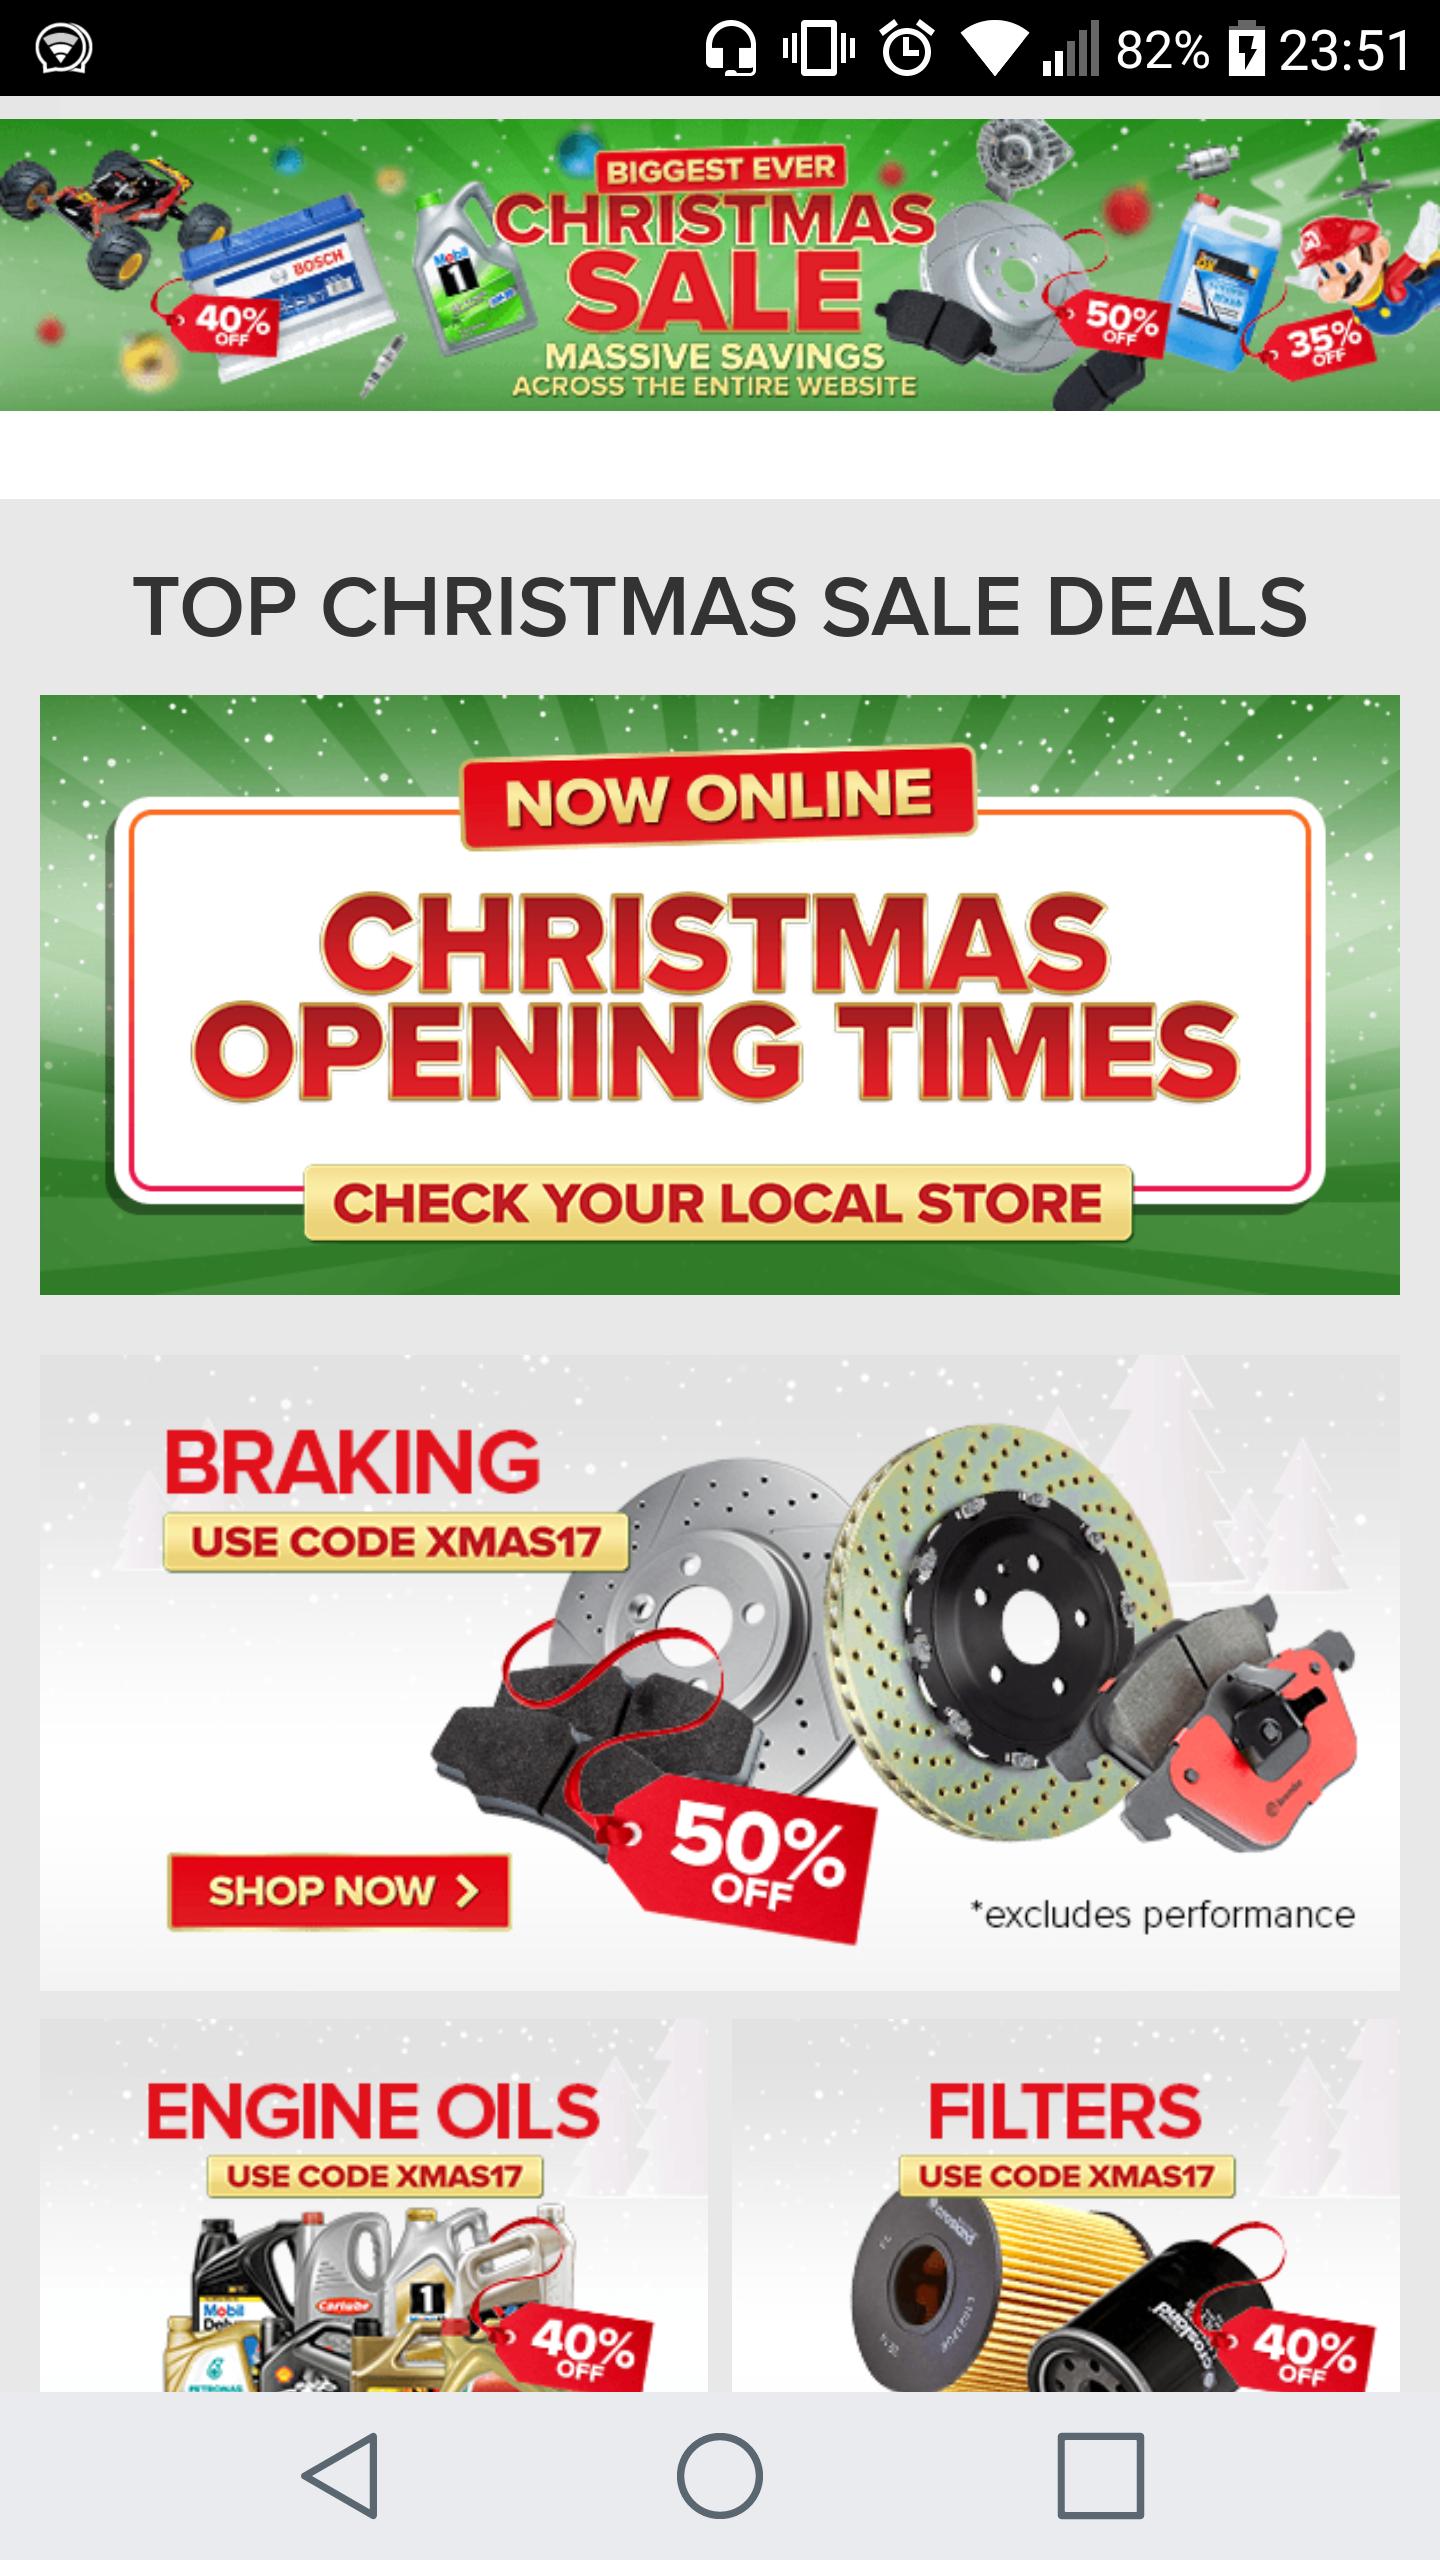 Car Service Deals Cheap Price Best Sale In Uk Hotukdeals